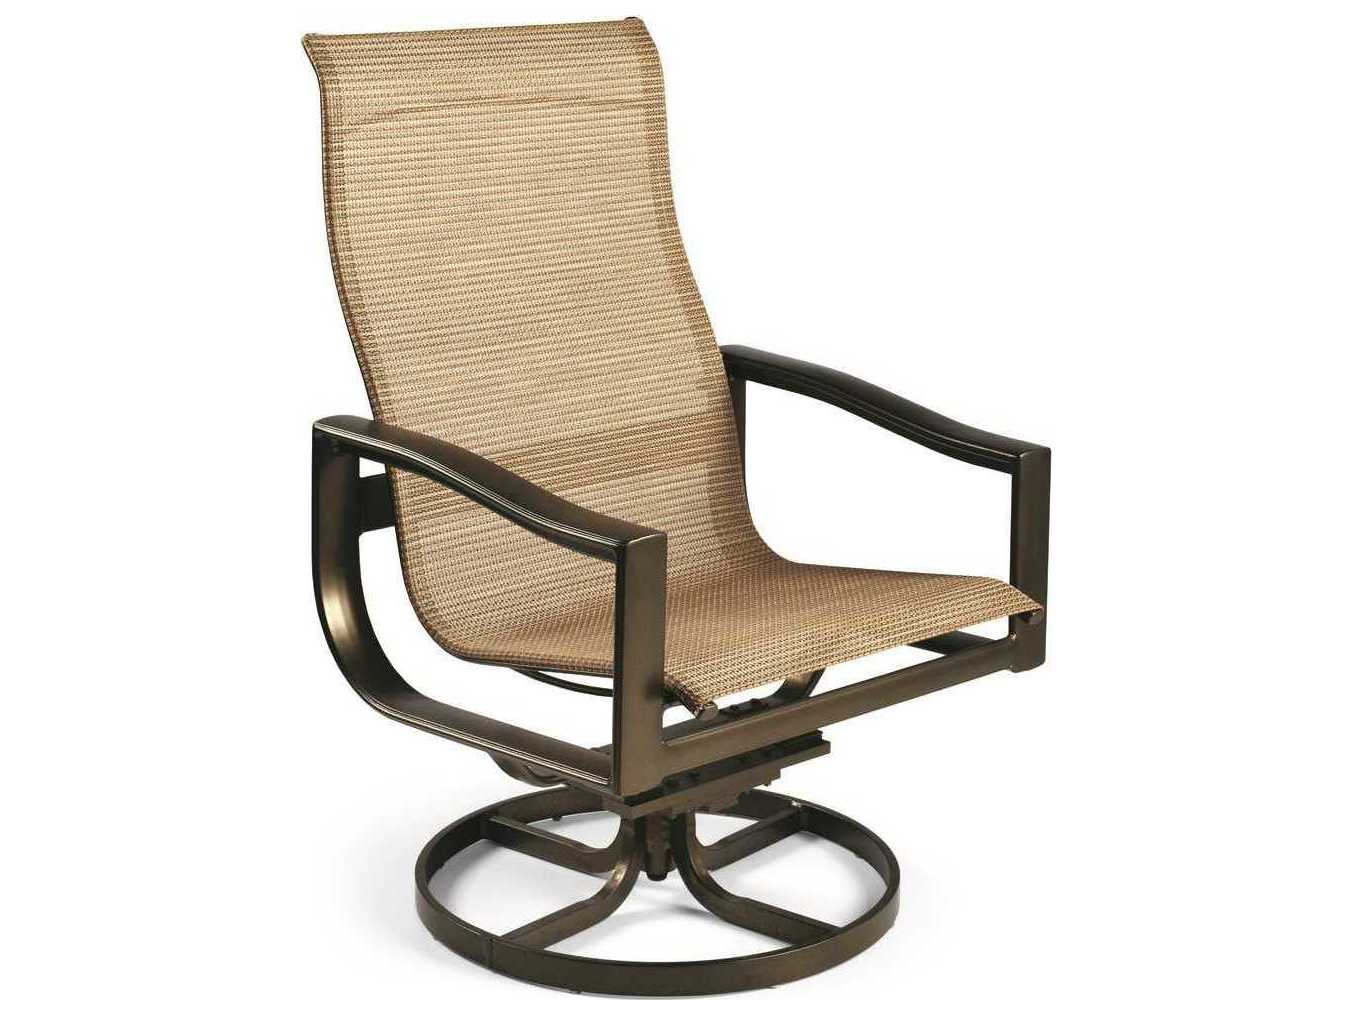 sling motion patio chairs metal dining chair winston belvedere aluminum high back swivel tilt